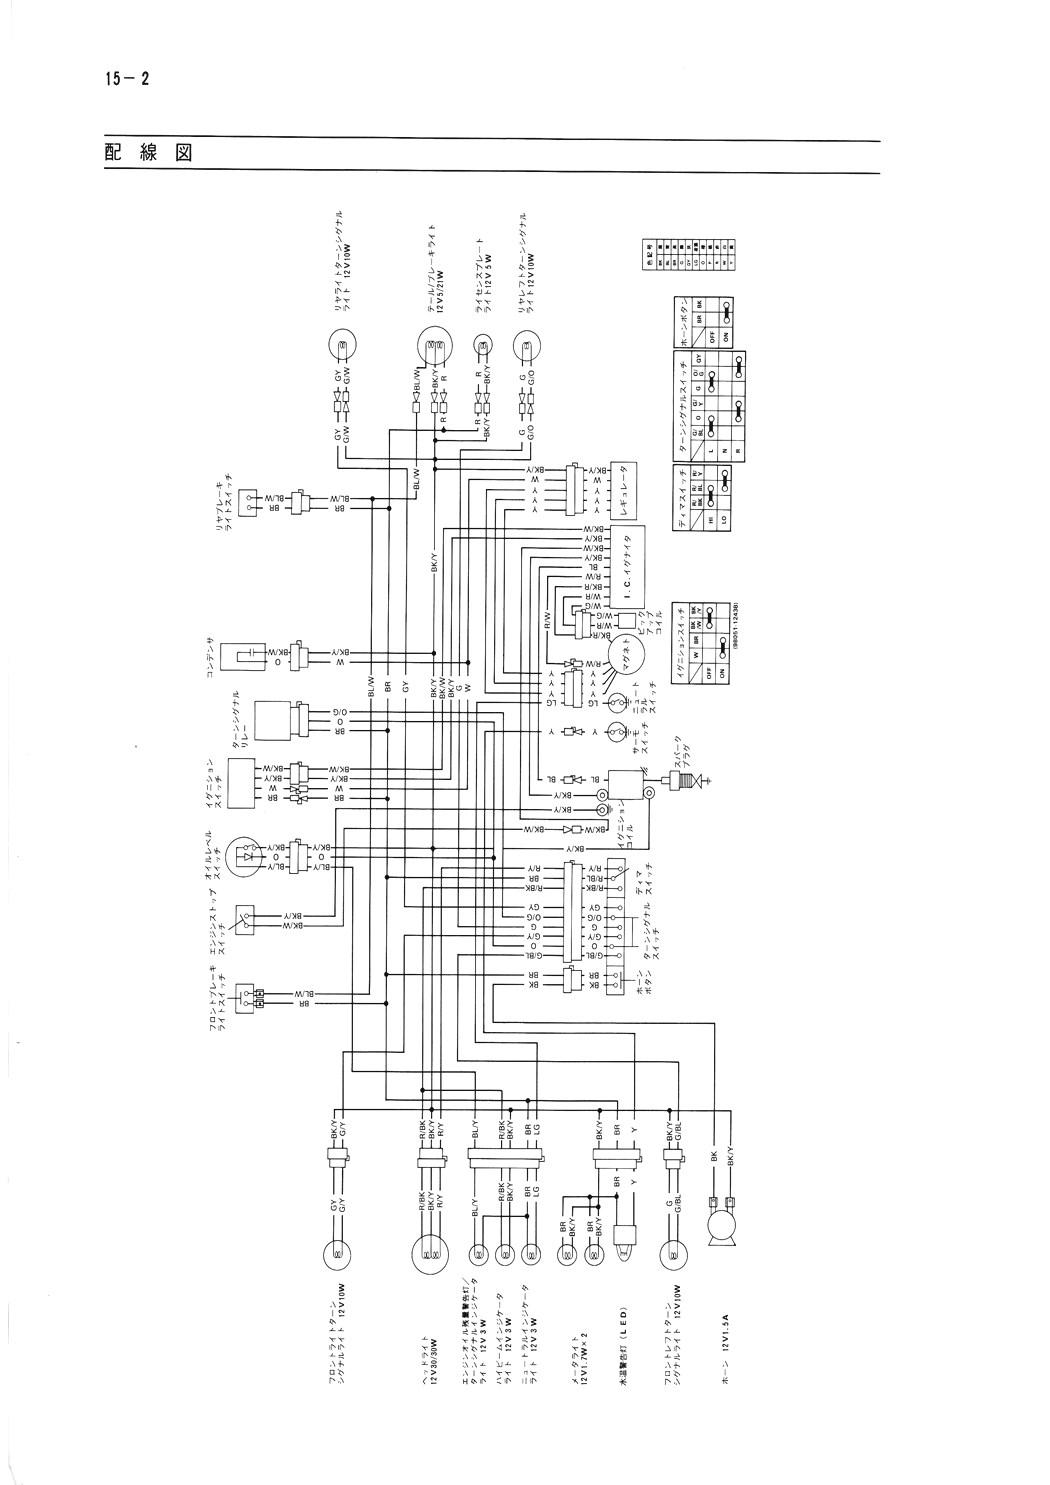 kdx250sr    wiring       diagram        imgbb